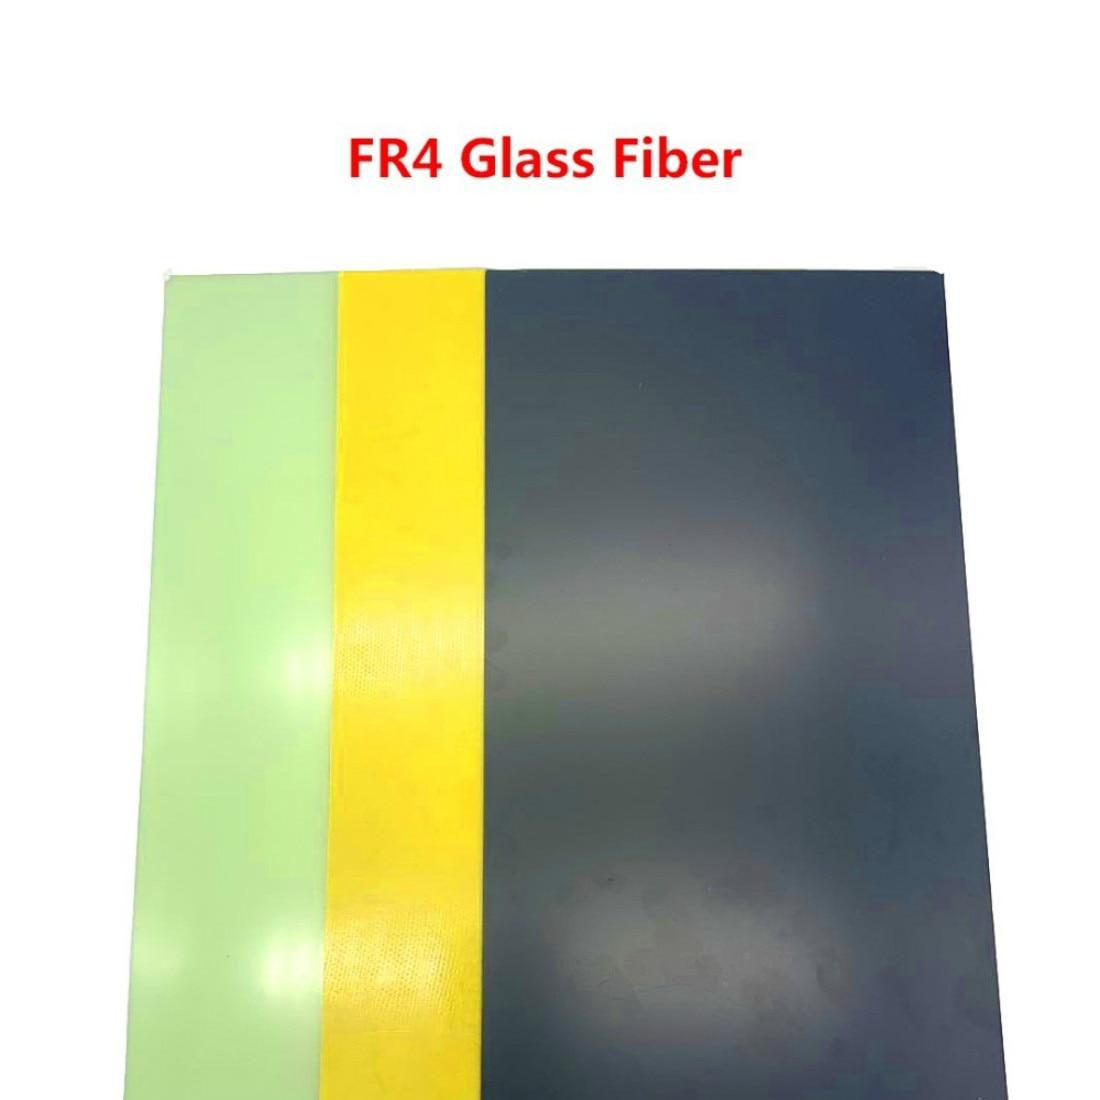 Negro amarillo fibra de plantilla de hoja de resina epoxi con fibra de vidrio de fibra de G10 Fr4 de fibra de vidrio placa Diy cuchillo mango Material 300x170mm